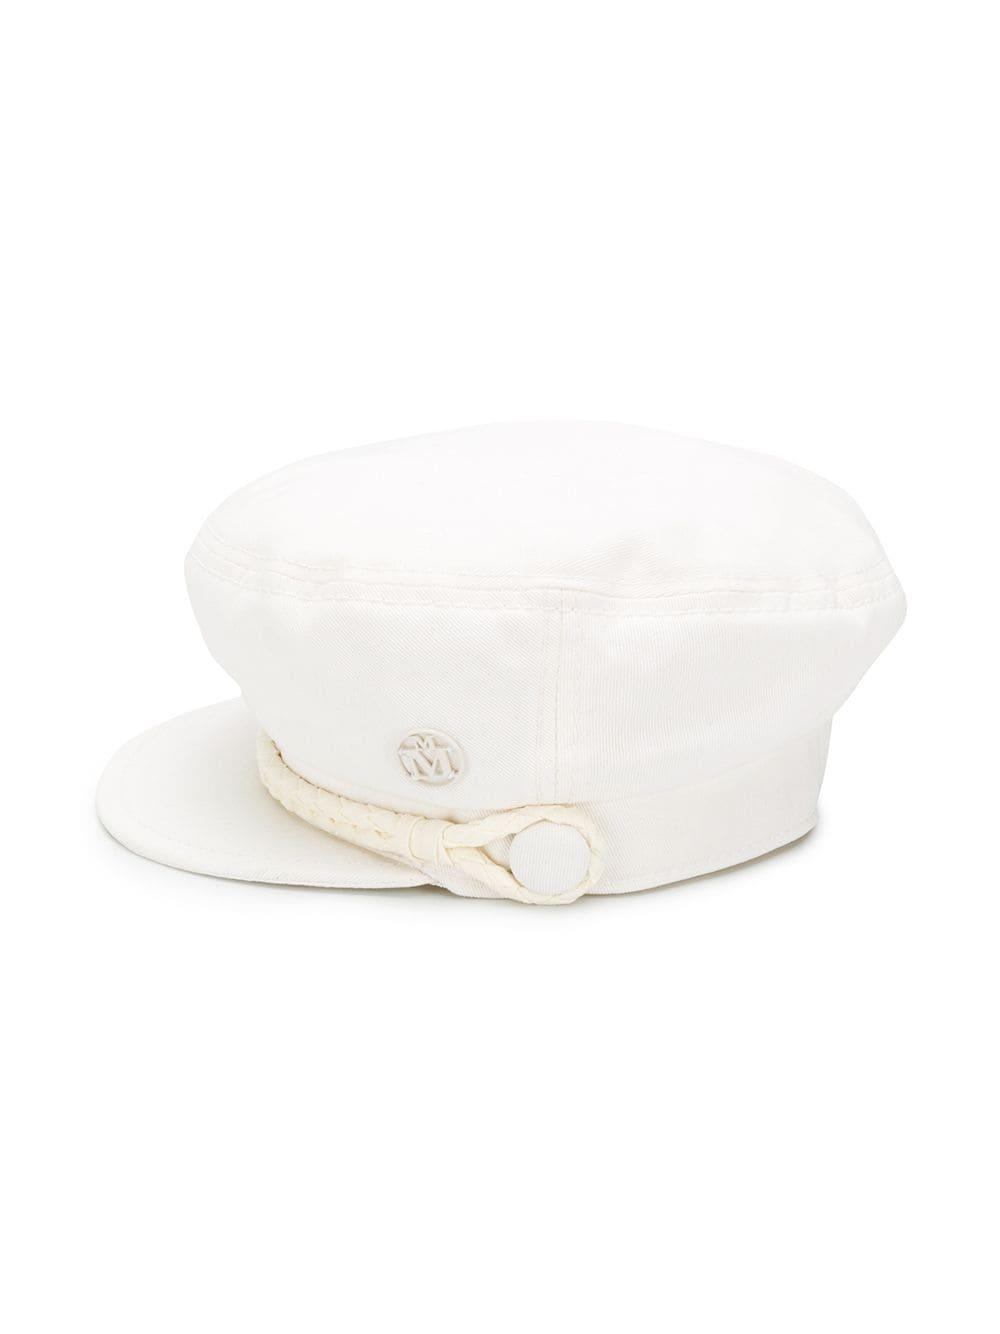 NEW ABBY HAT 20PS CUT & SEW